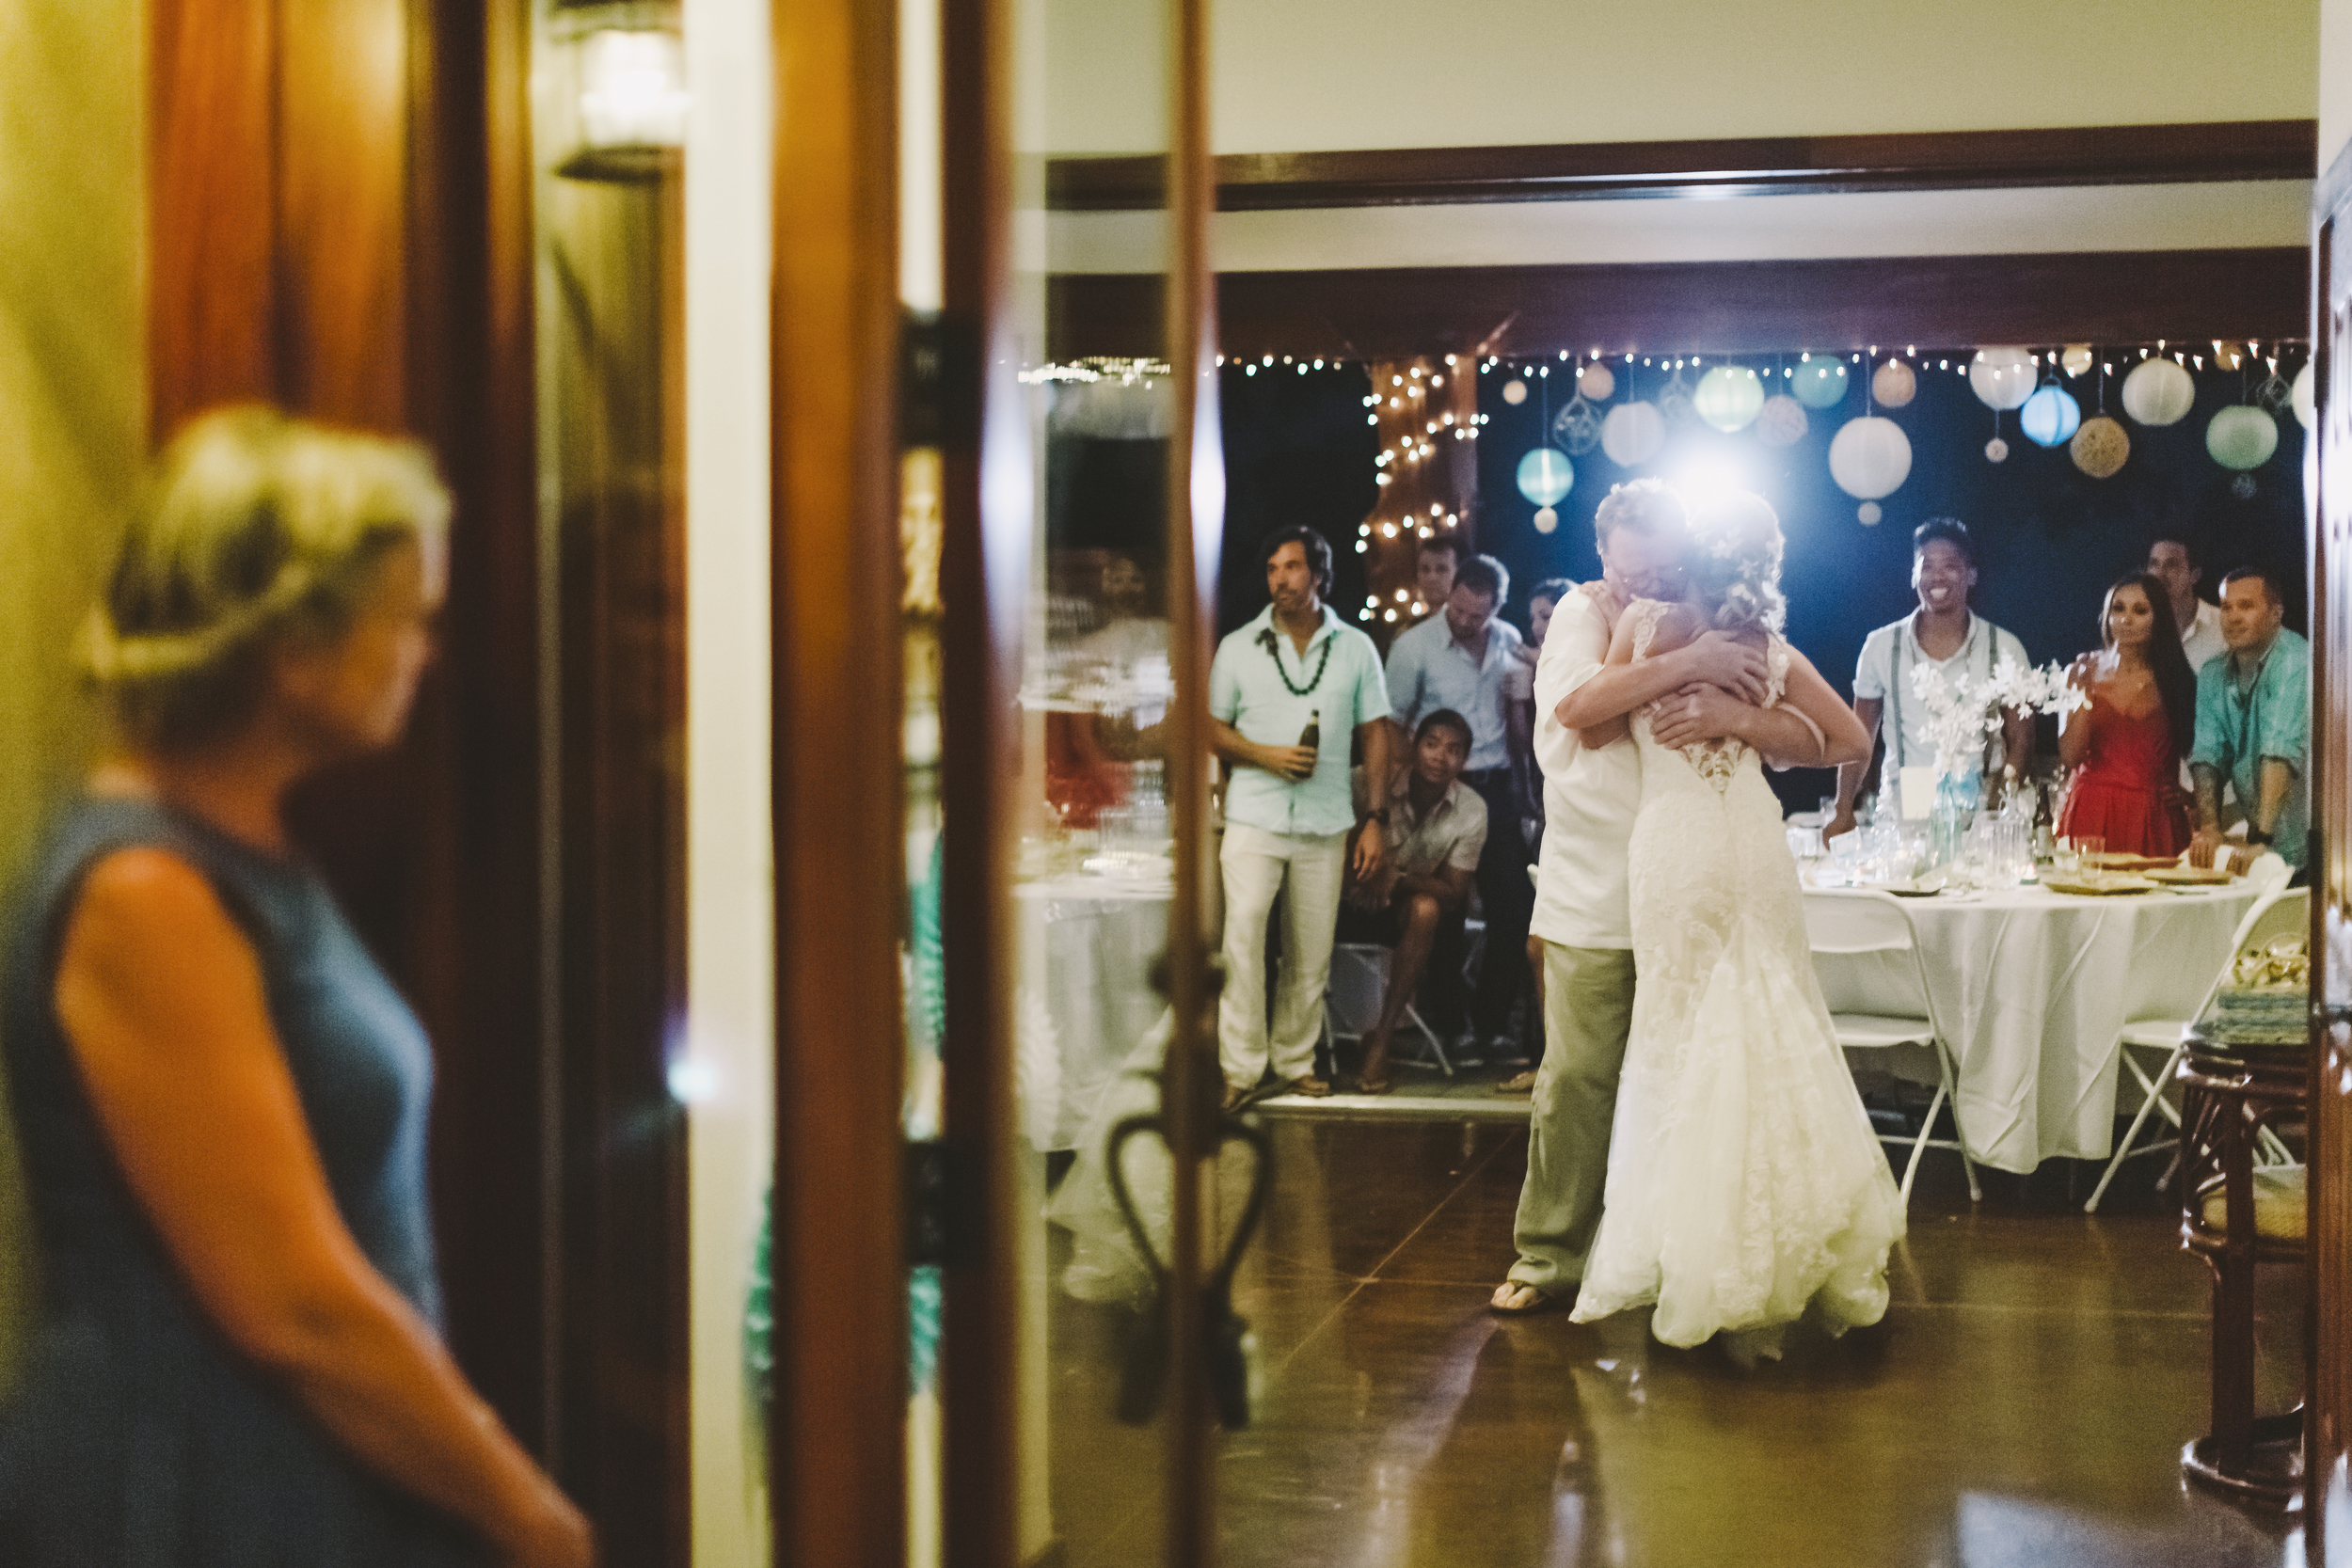 angie-diaz-photography-hawaii-wedding-photographer-kelli-jay-127.jpg